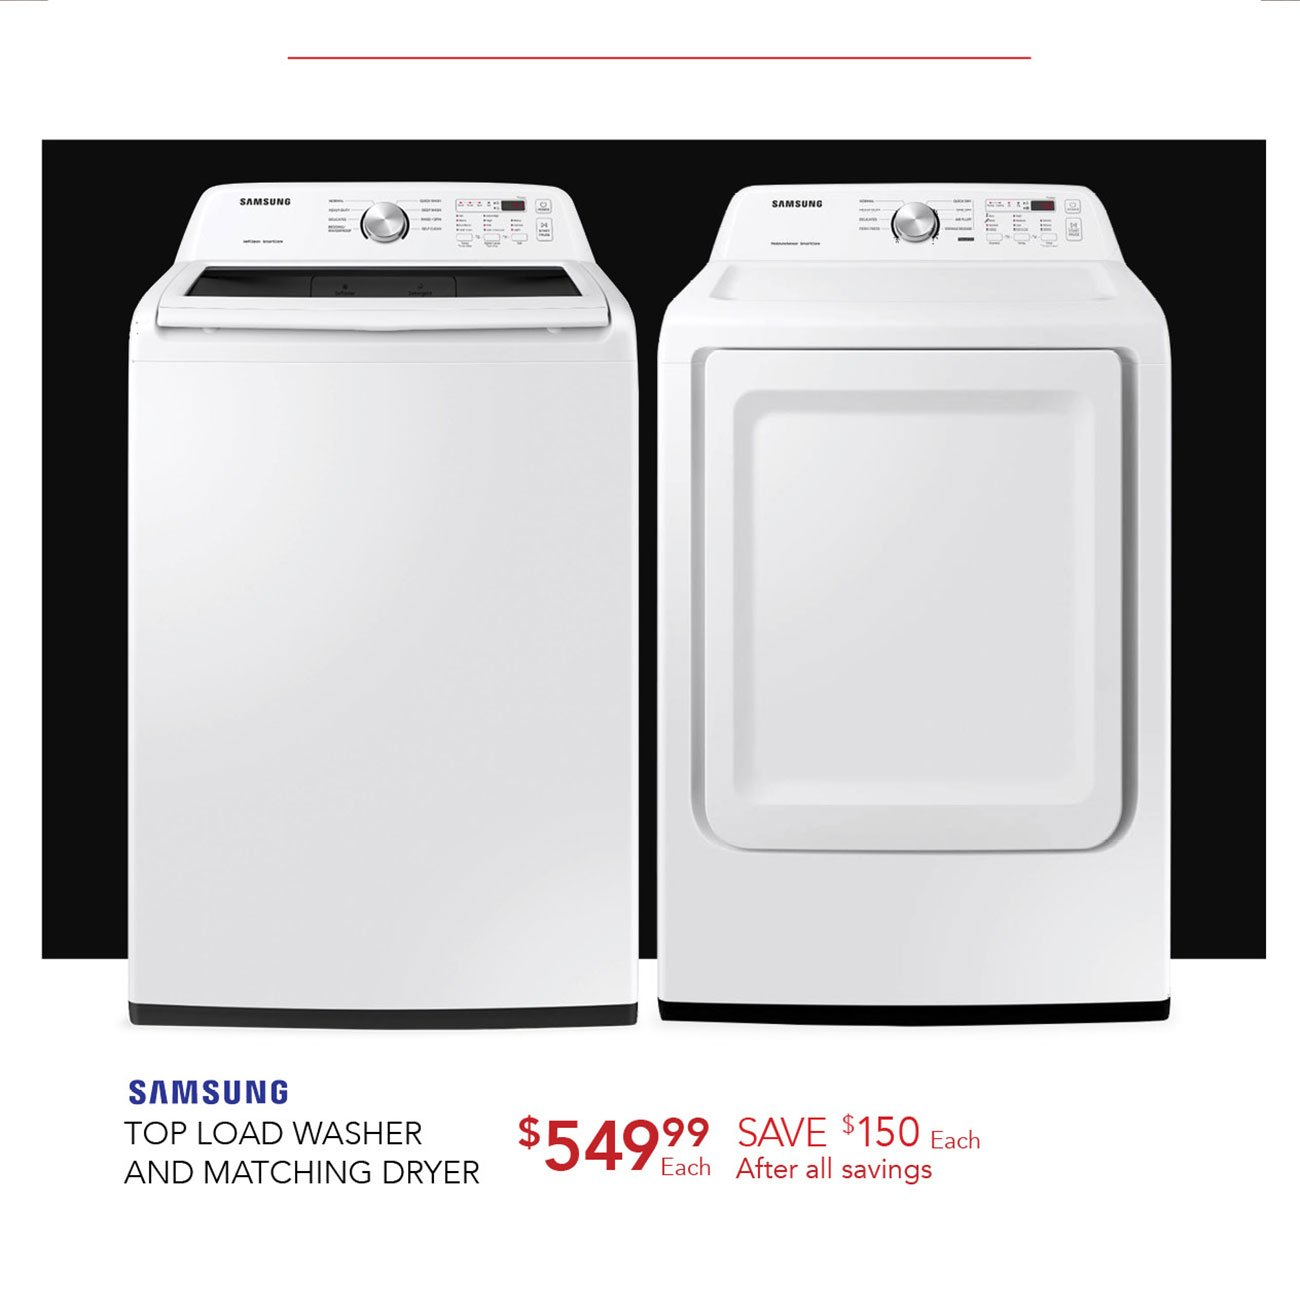 Samsung-top-load-washer-dryer